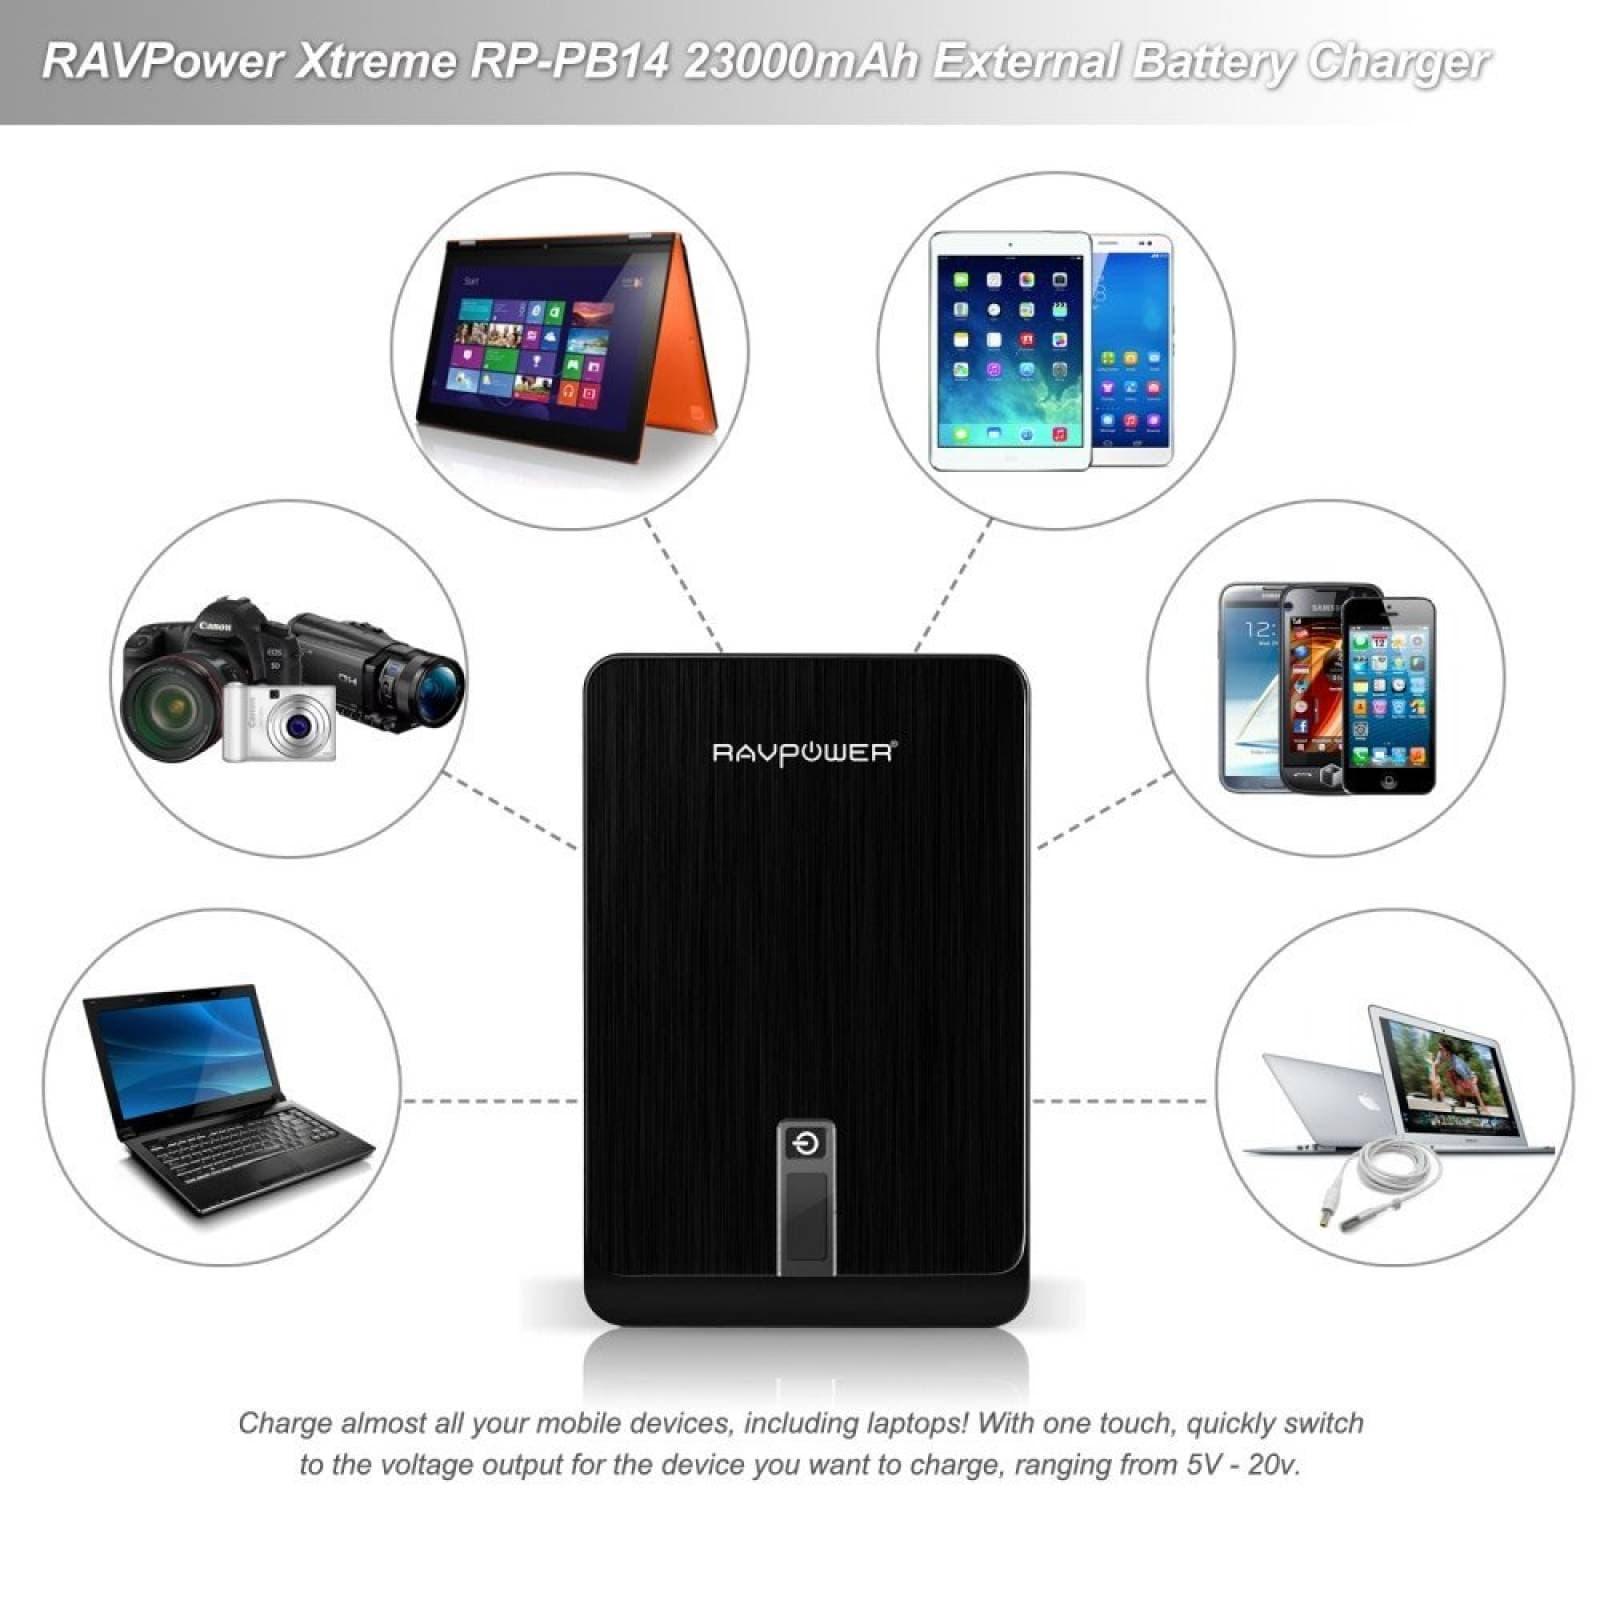 RAVPower 23000mAh cargador portátil 4.5A DC salida externa b